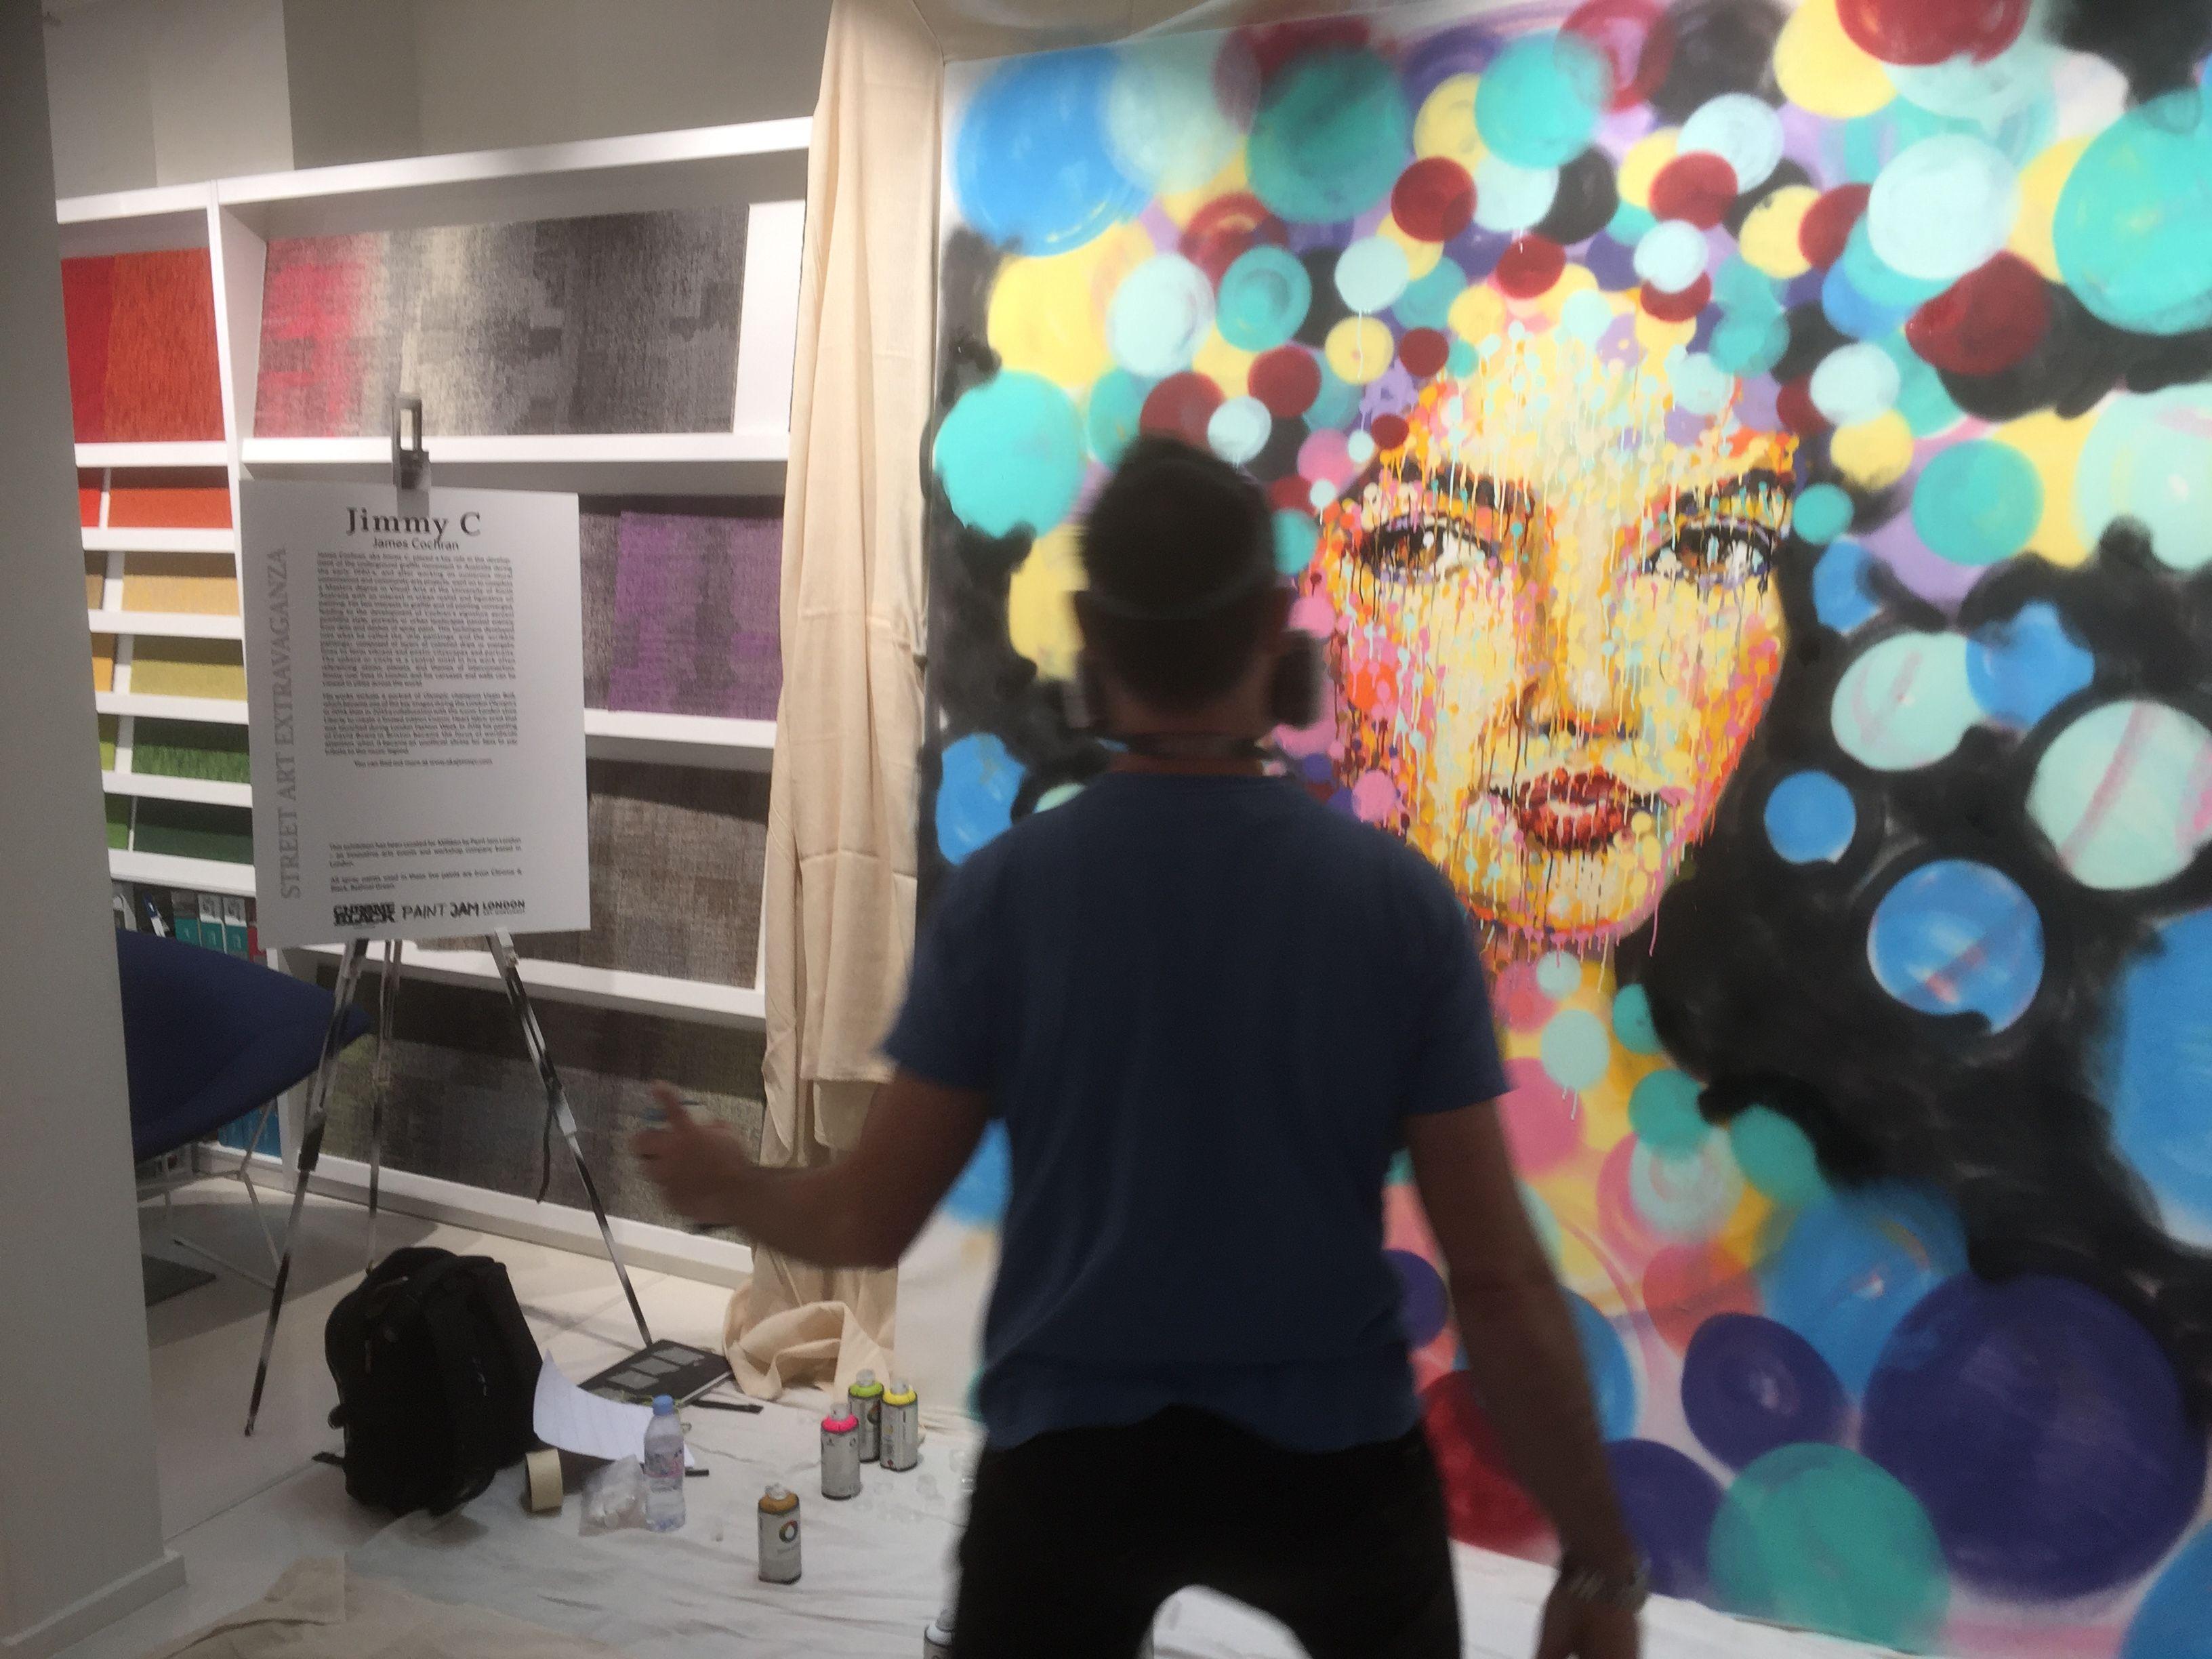 Jimmy's Street Art at Milliken Street Art Extravaganza at @cdwfestival #CDW2016